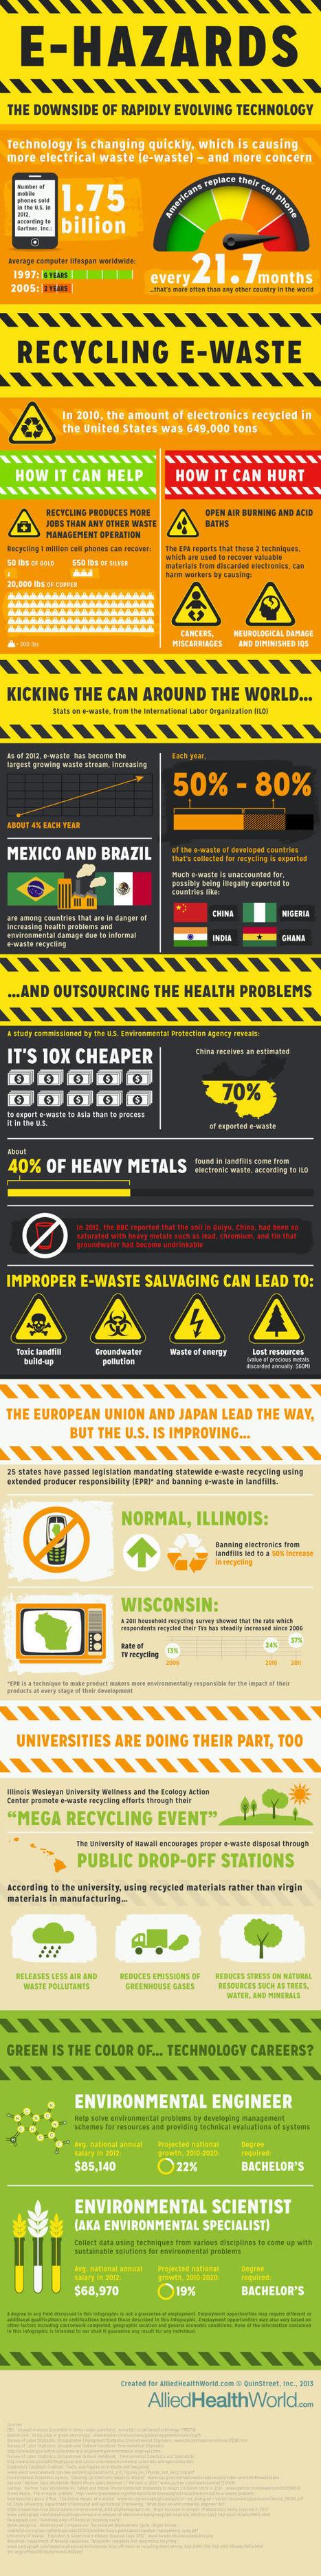 E-Hazards: Manifest Tragedy [Infographic] | green infographics | Scoop.it